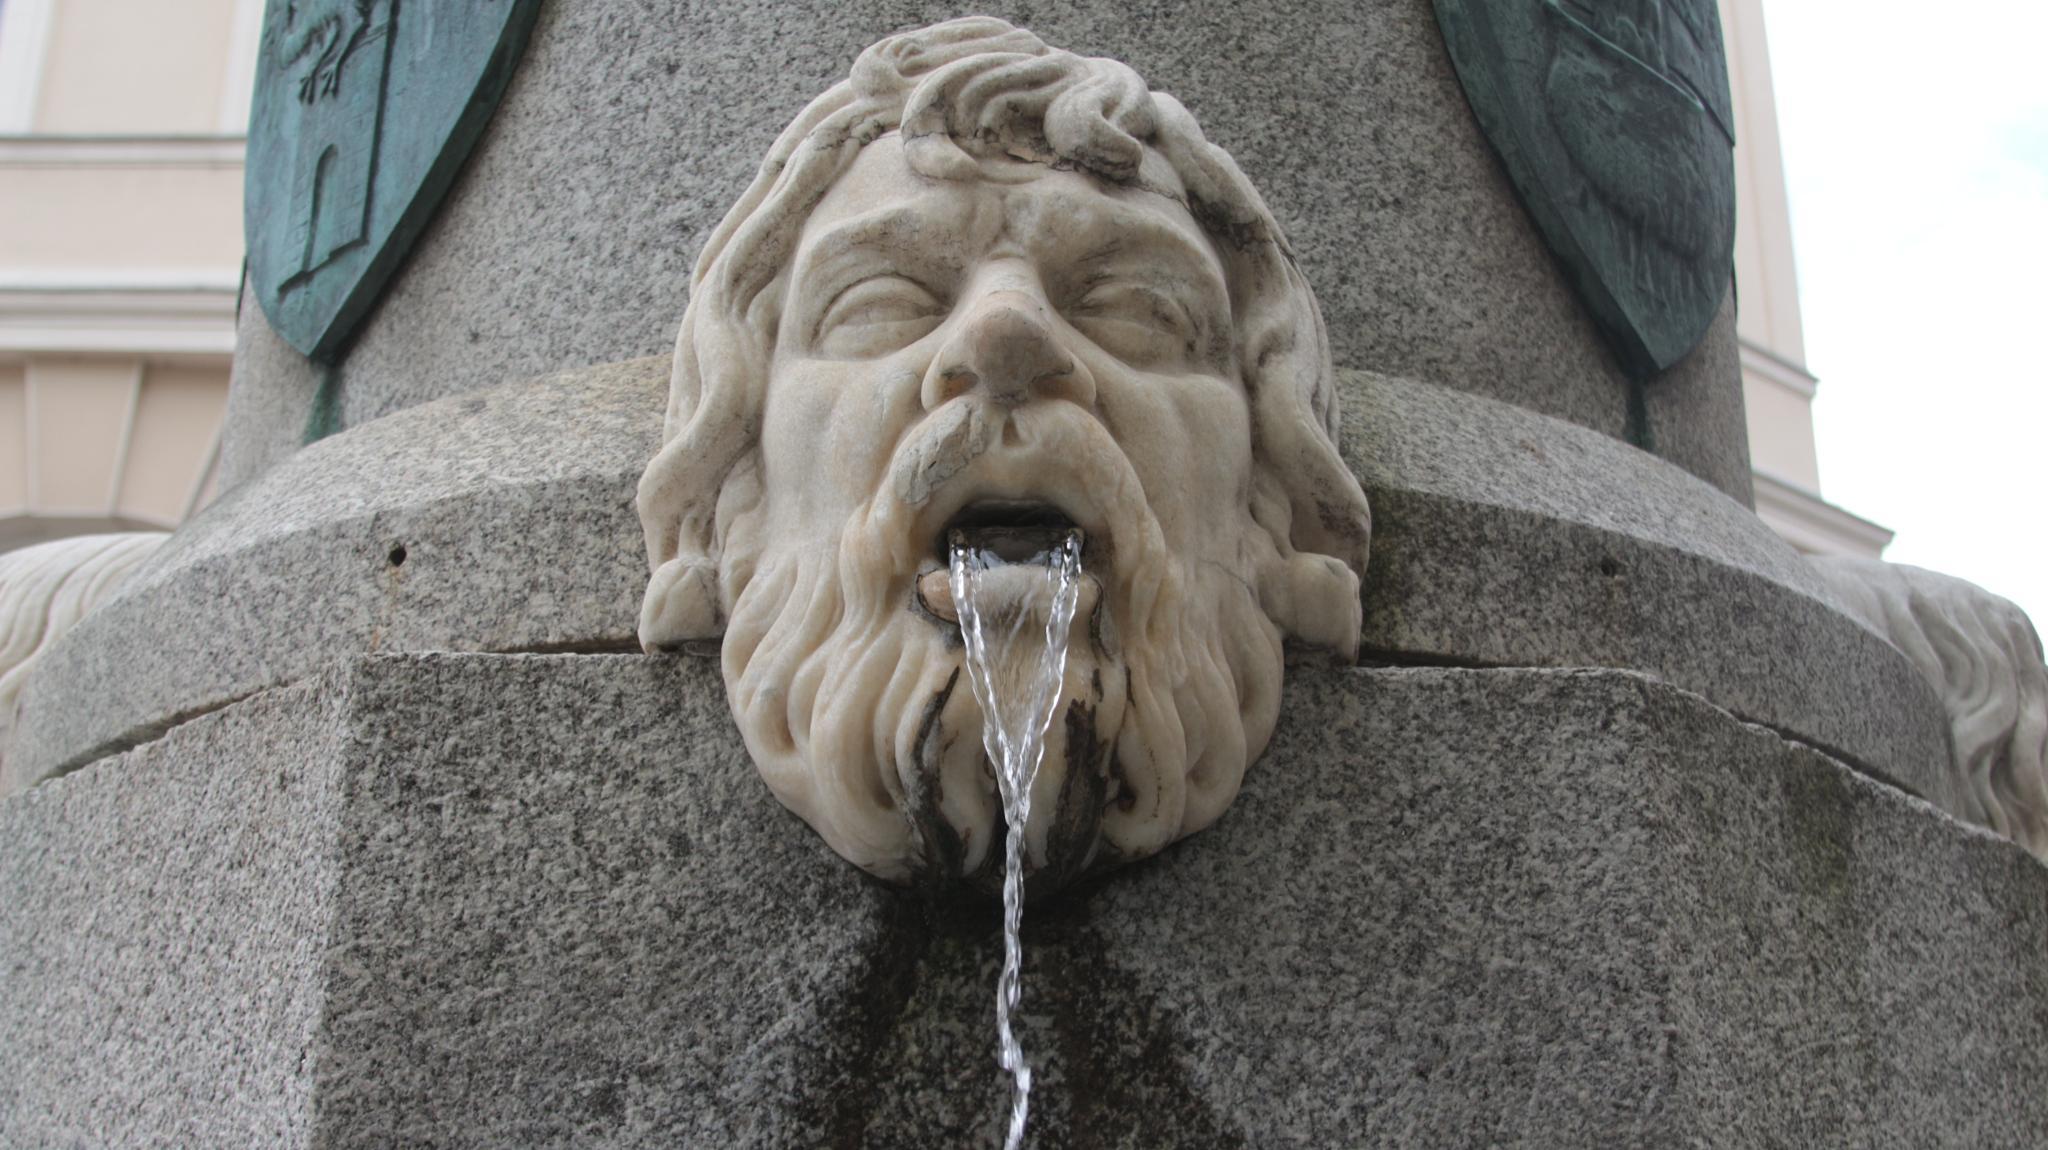 Klagenfurt, monumento dedicato al fondatore della città, Herzog Bernhard von Spanheim (particolare) by meiferdinando